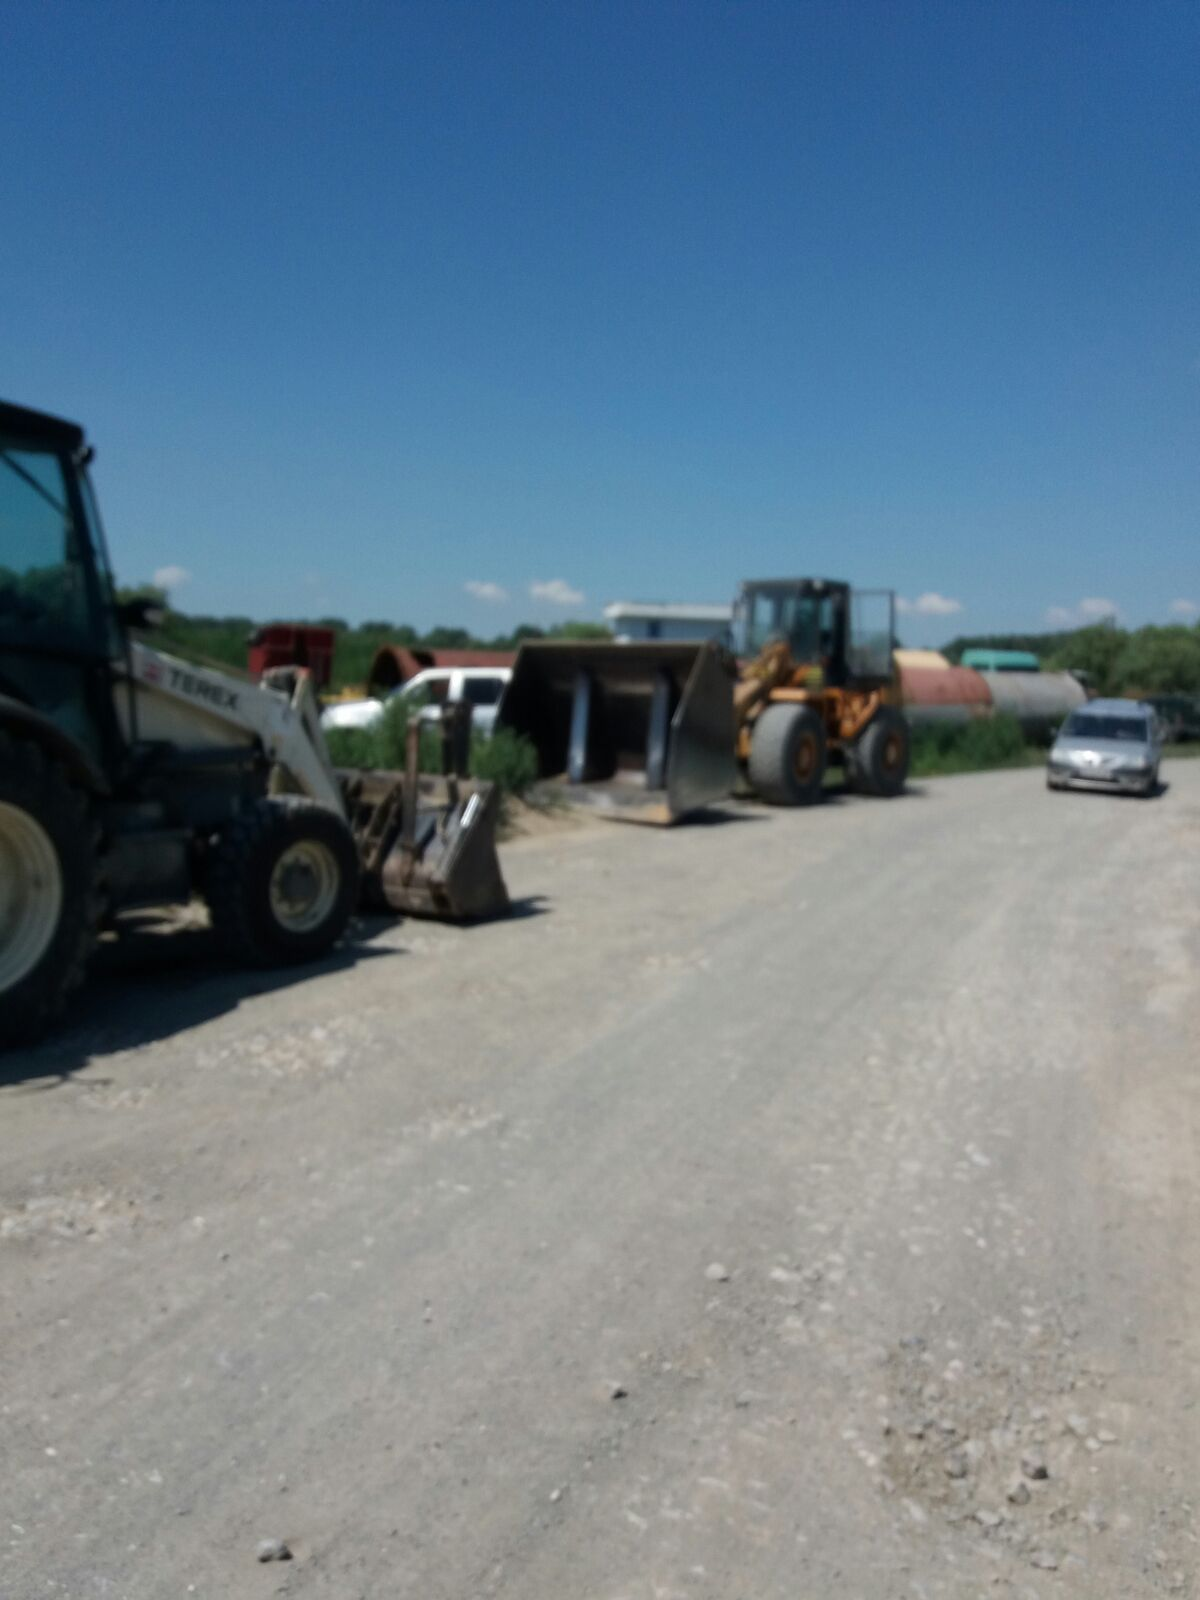 Conflict pe Sireasa: o echipă de la IPJ Tulcea a debarcat ieri la Ceatalchioi